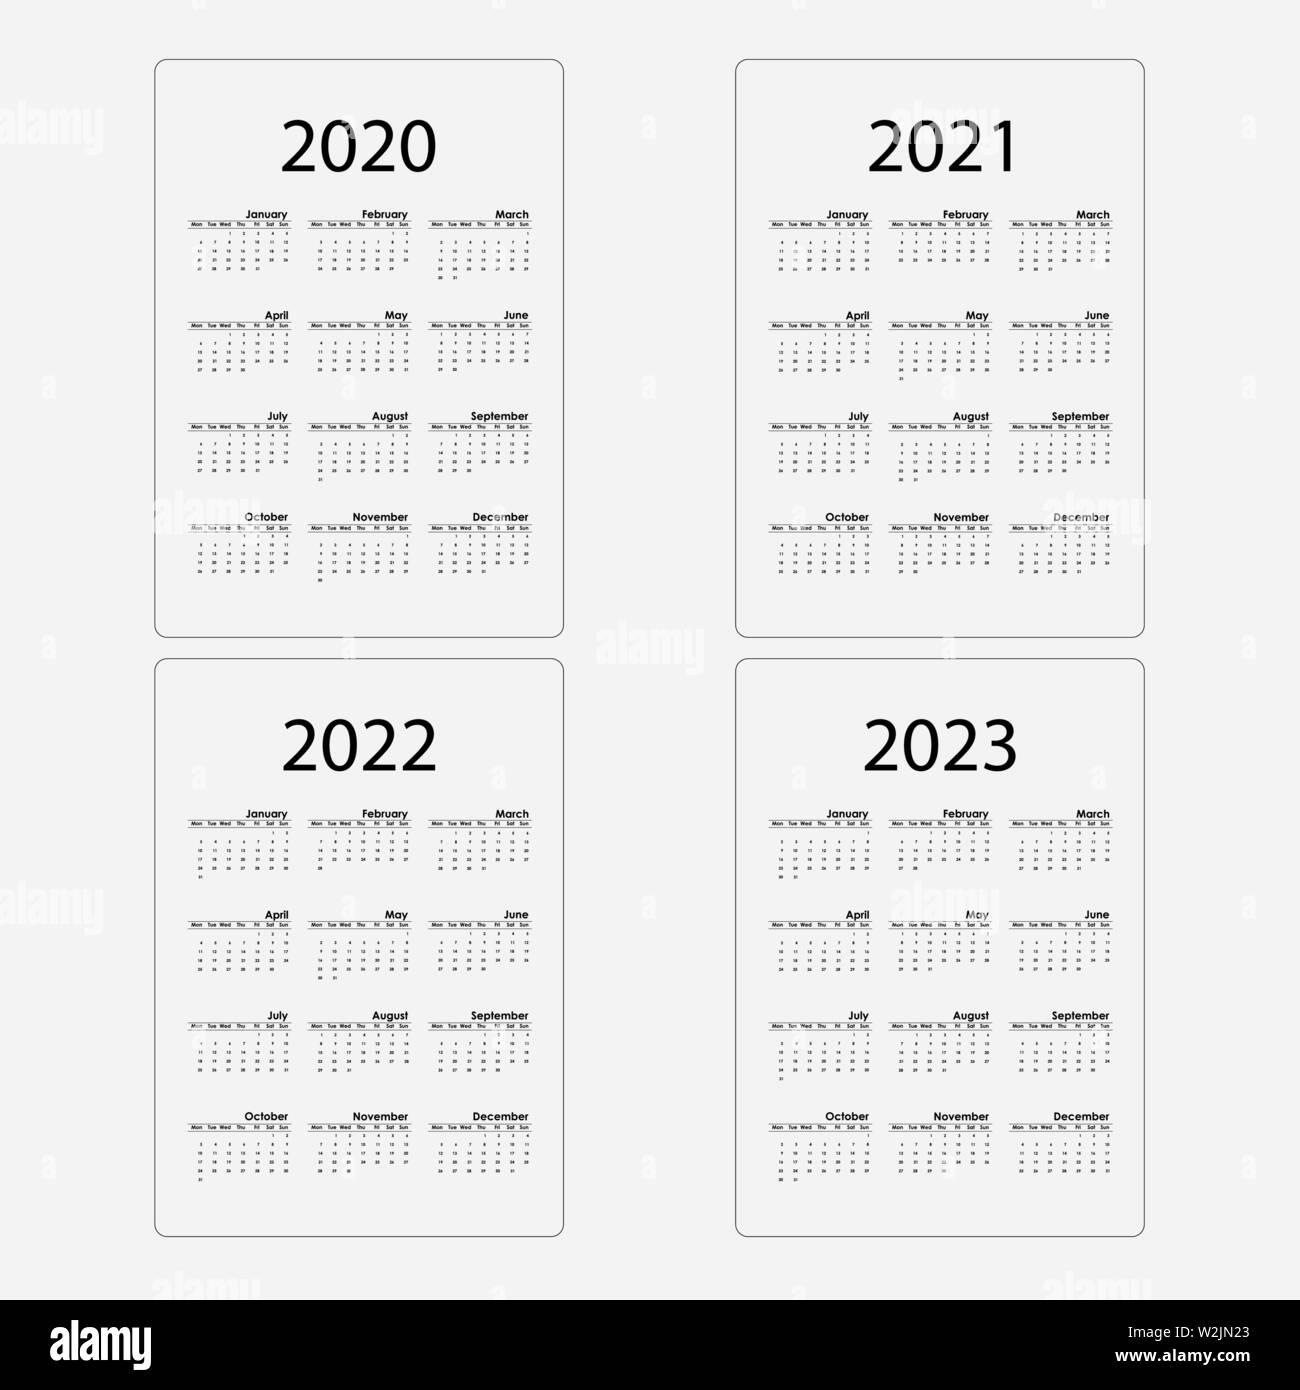 Calendar 2020, 2021,2022 and 2023 Calendar template.Calendar